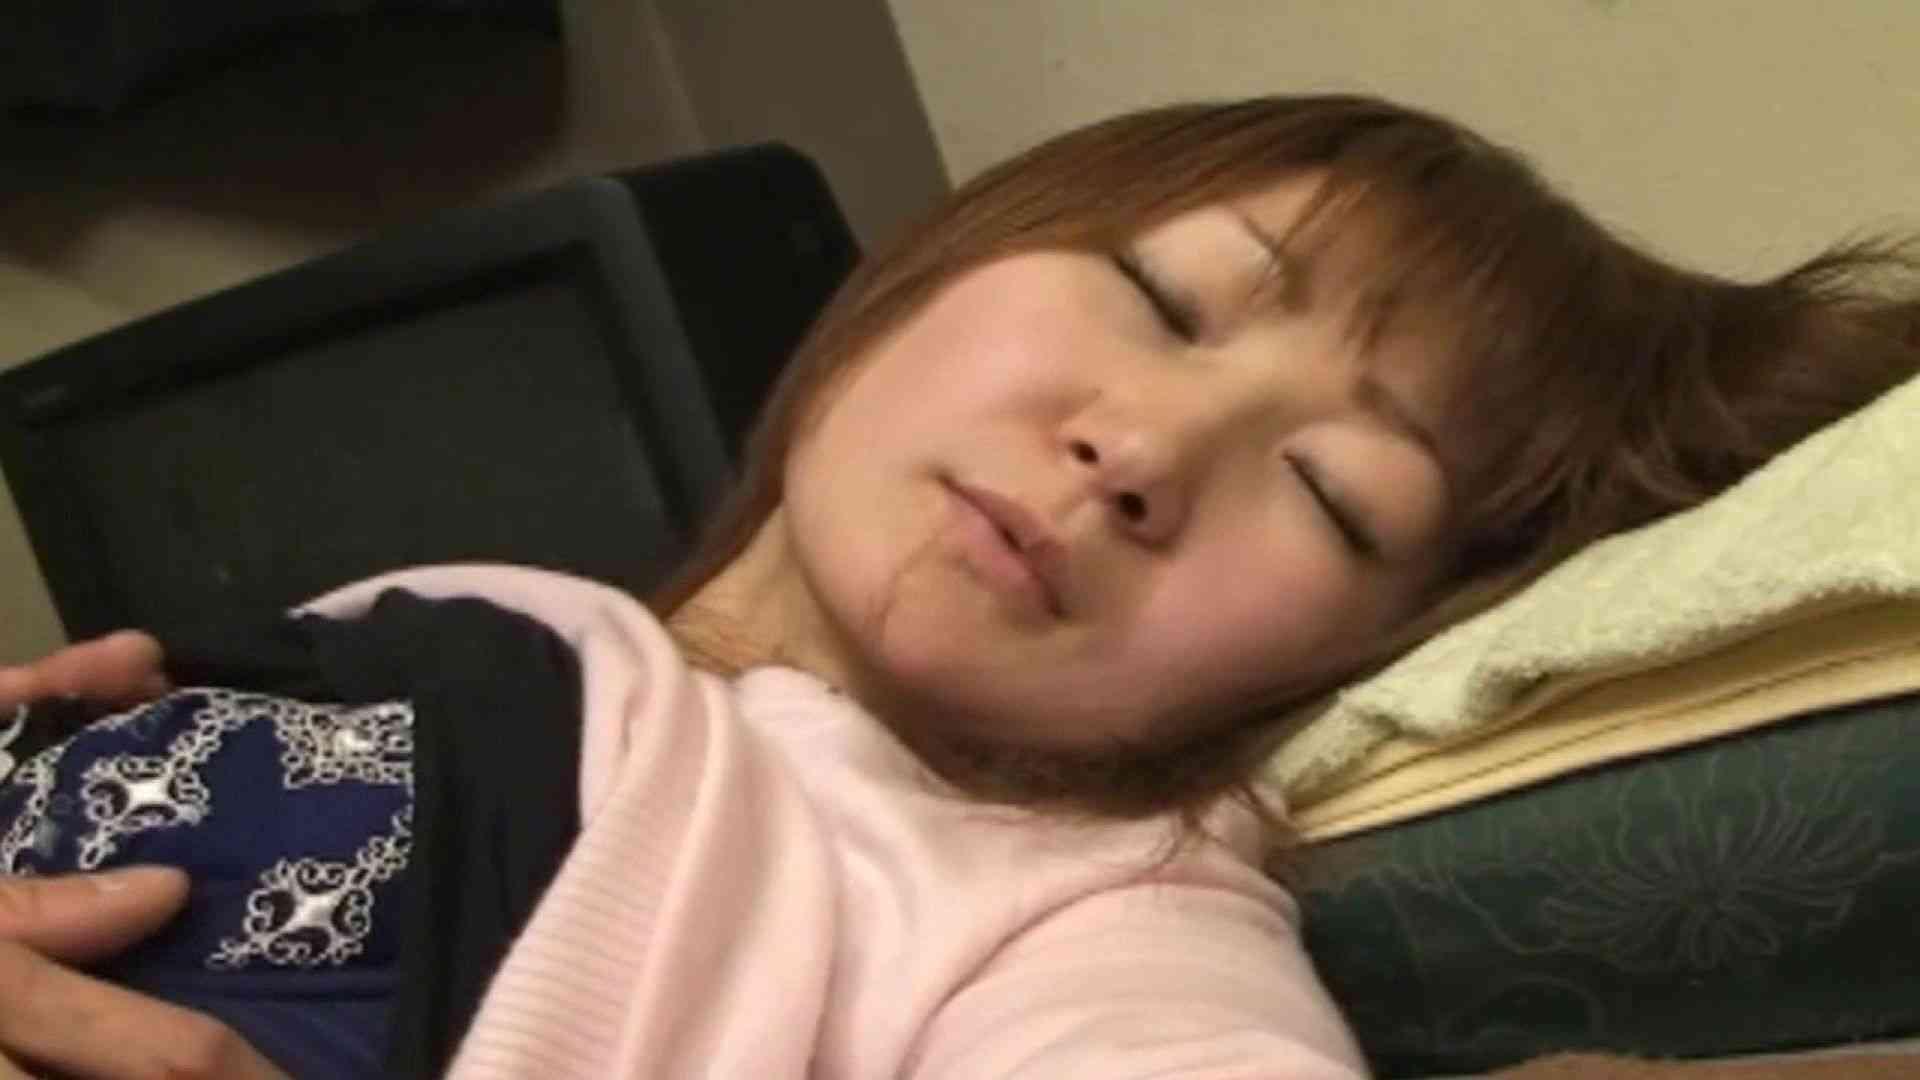 S級厳選美女ビッチガールVol.07 OLヌード天国 オマンコ動画キャプチャ 51PIX 17